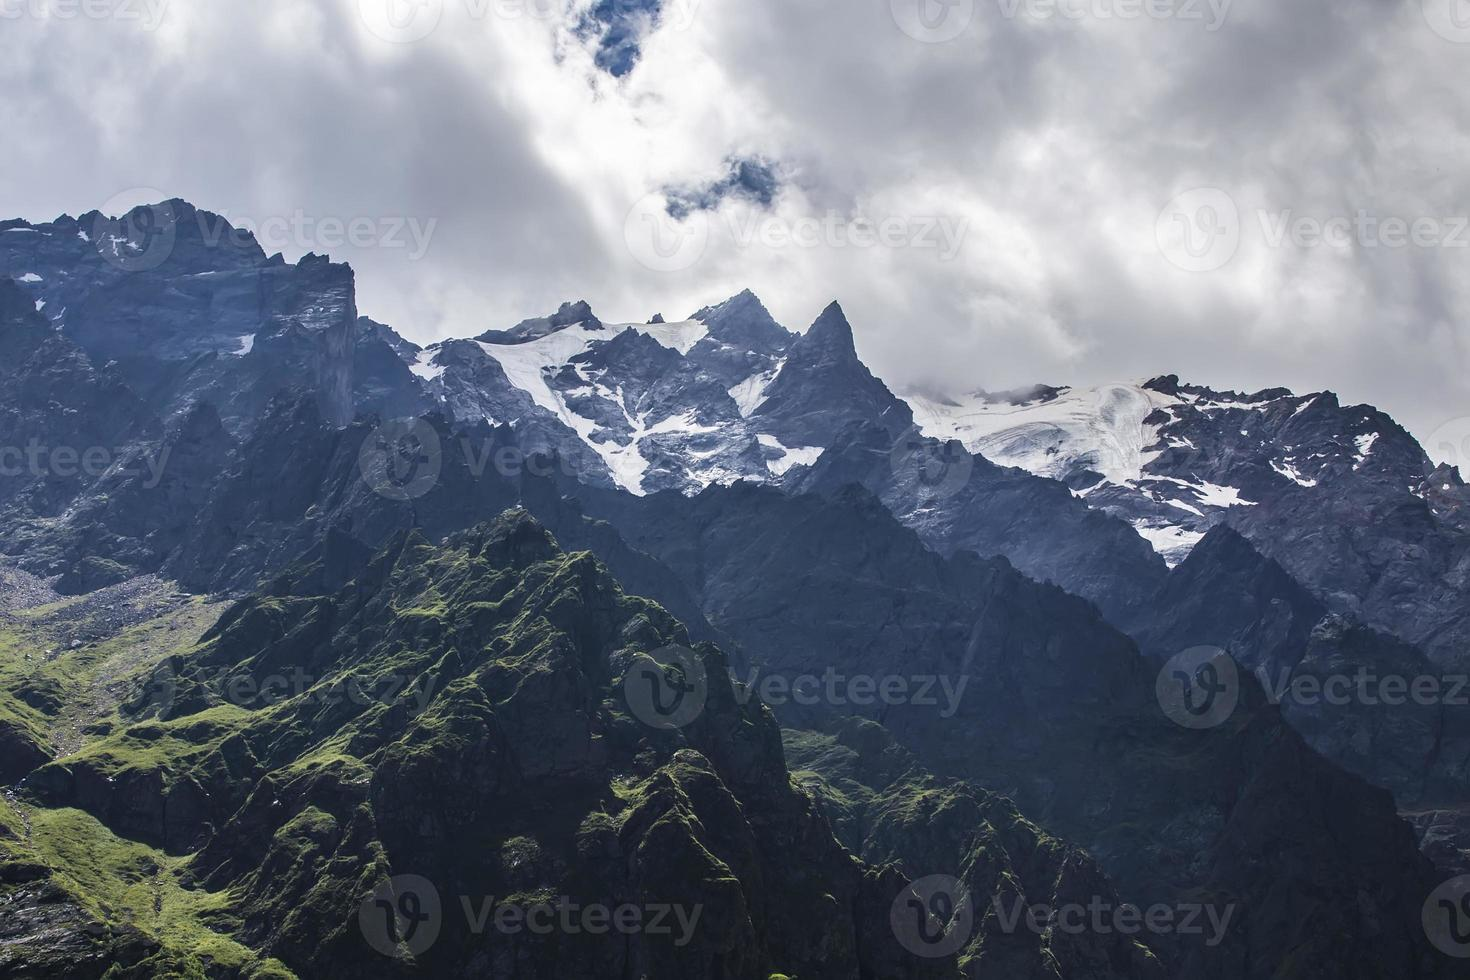 Tseyskoe gorge. Mountains photo